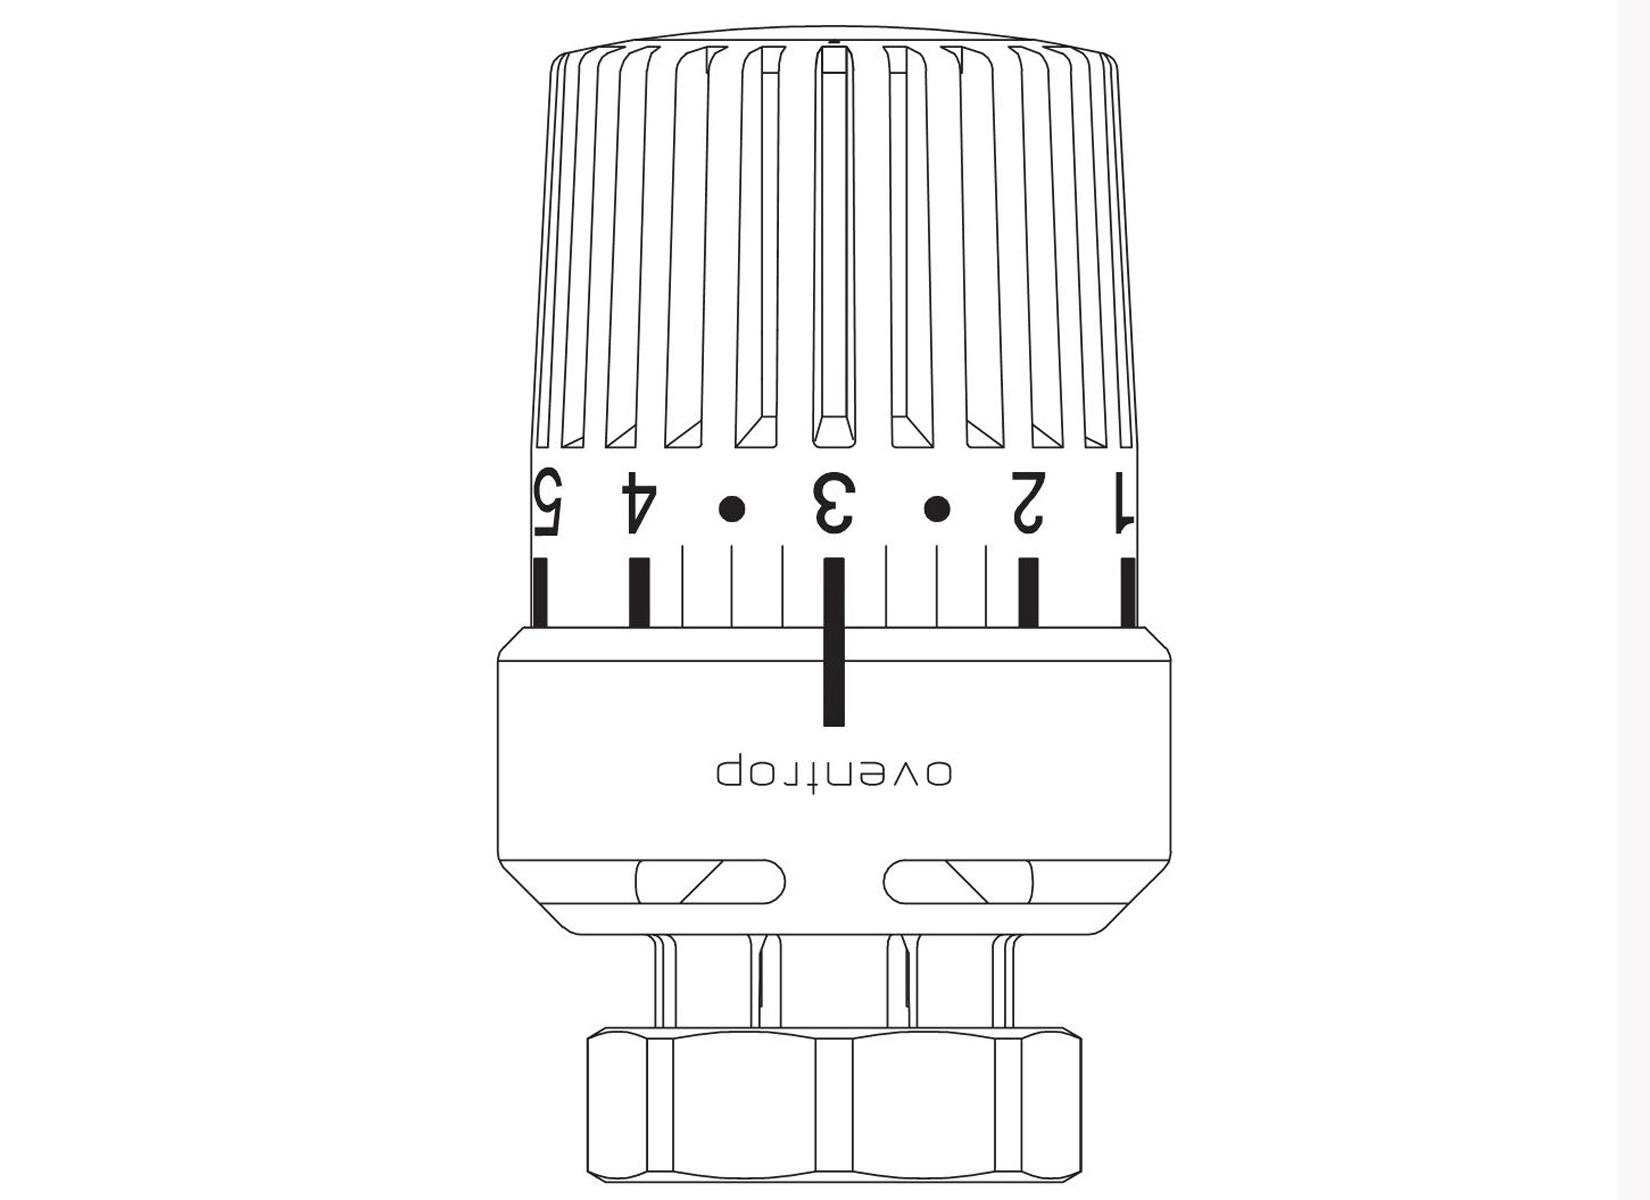 oventrop thermostatkopf uni ldvl 26 mm f r danfoss thermostatventil ravl 4026755365382 ebay. Black Bedroom Furniture Sets. Home Design Ideas